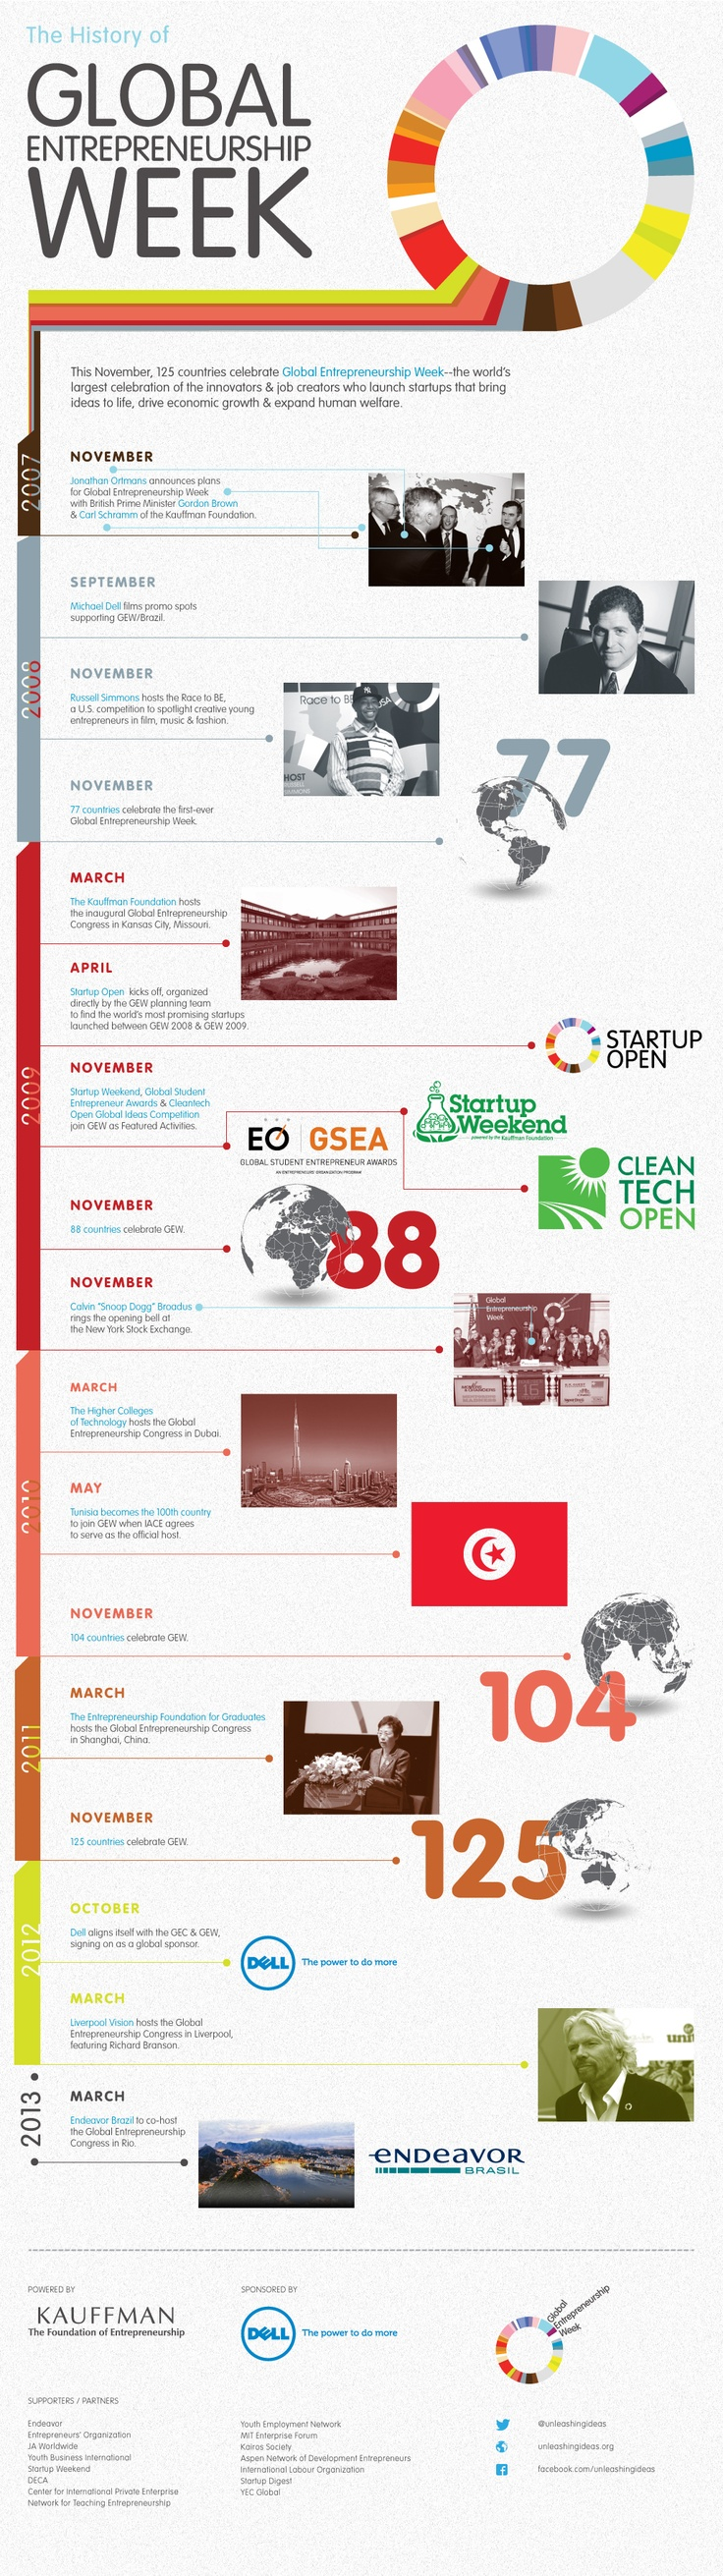 The History of Global Entrepreneurship Week.    Walden University    http://waldenu.edu